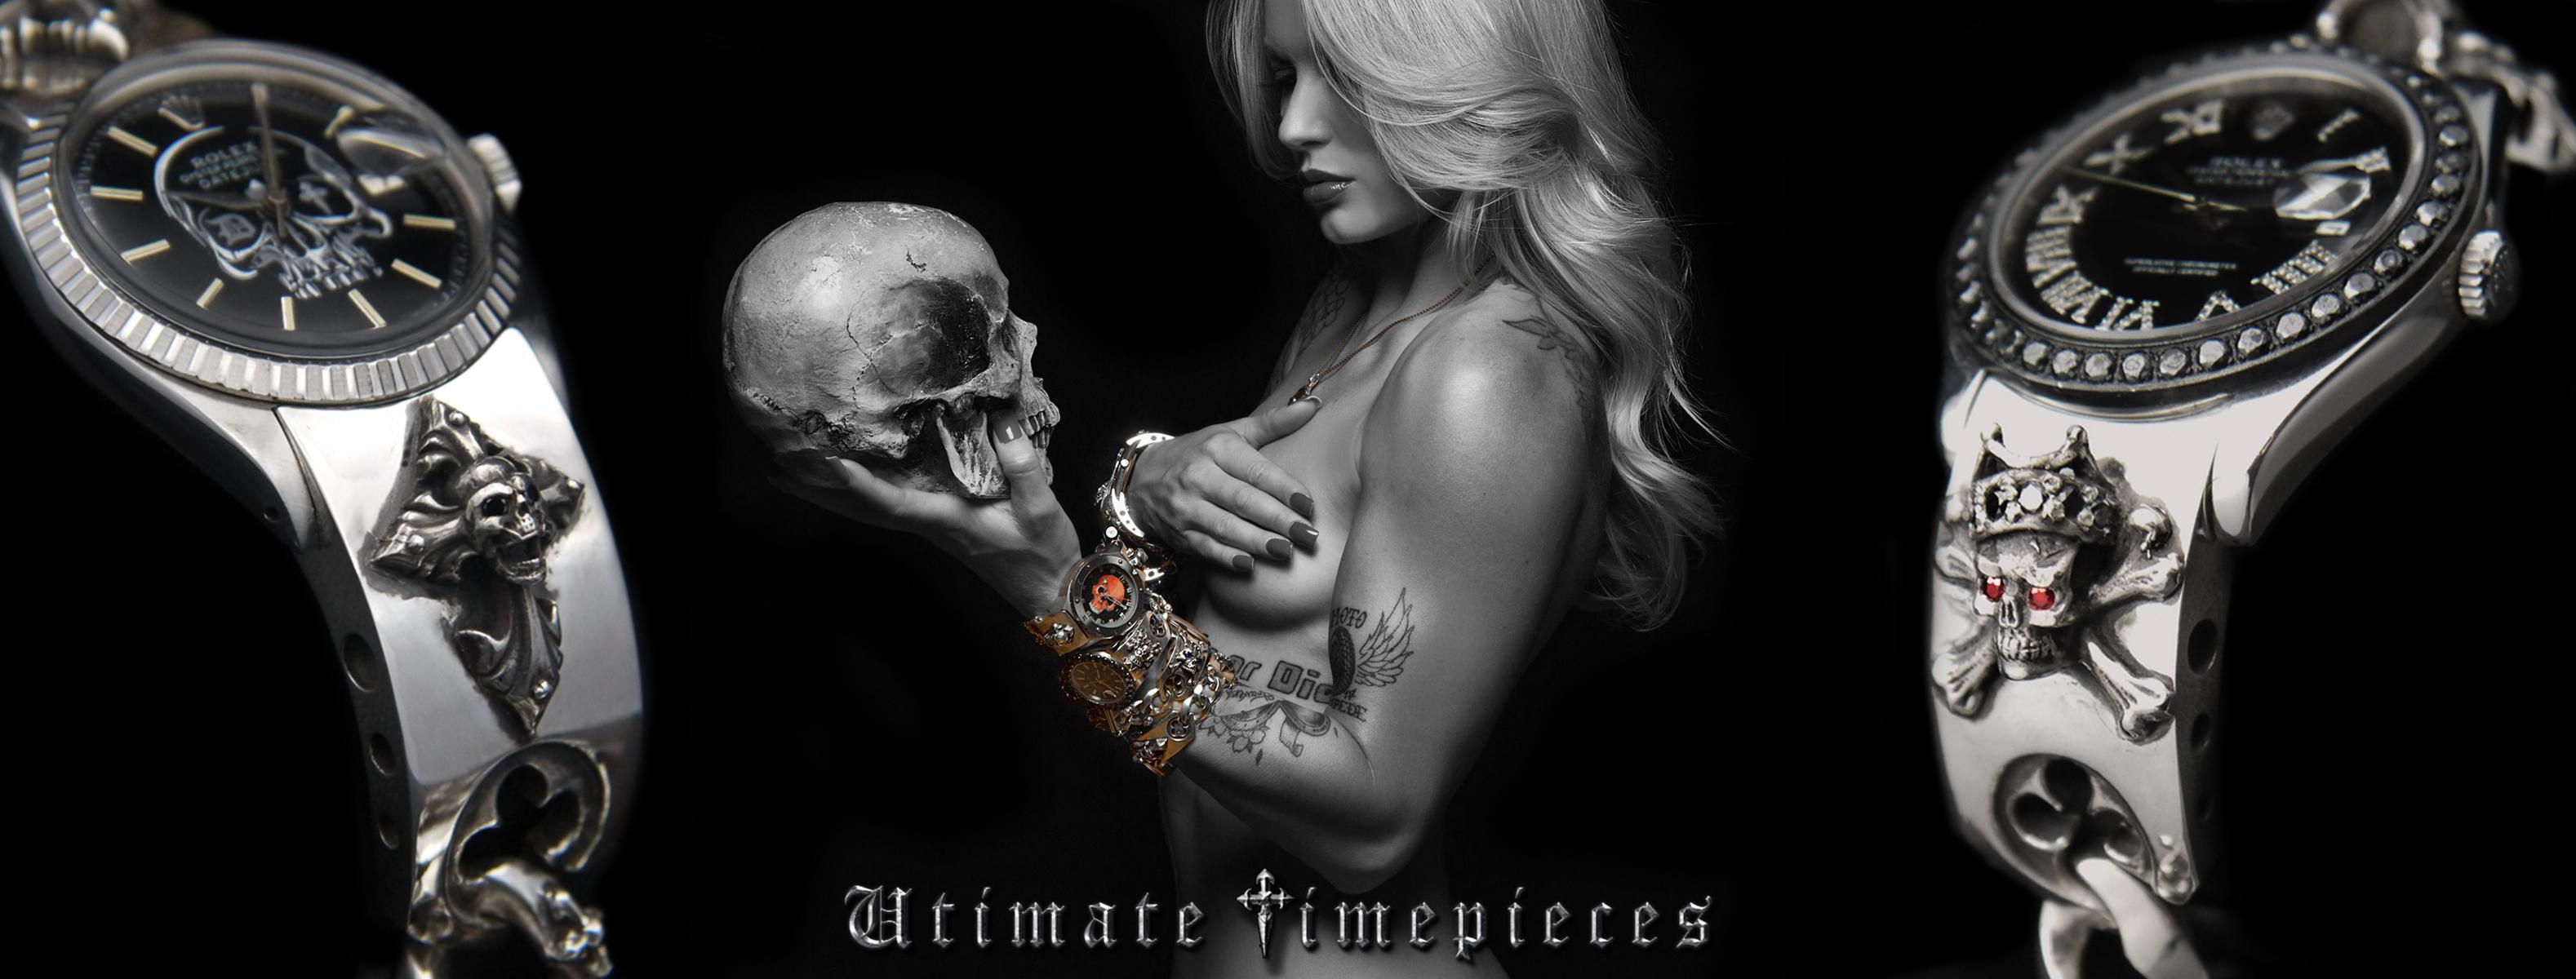 dark-triumph-fb-cover-stephanie-skull.jpg